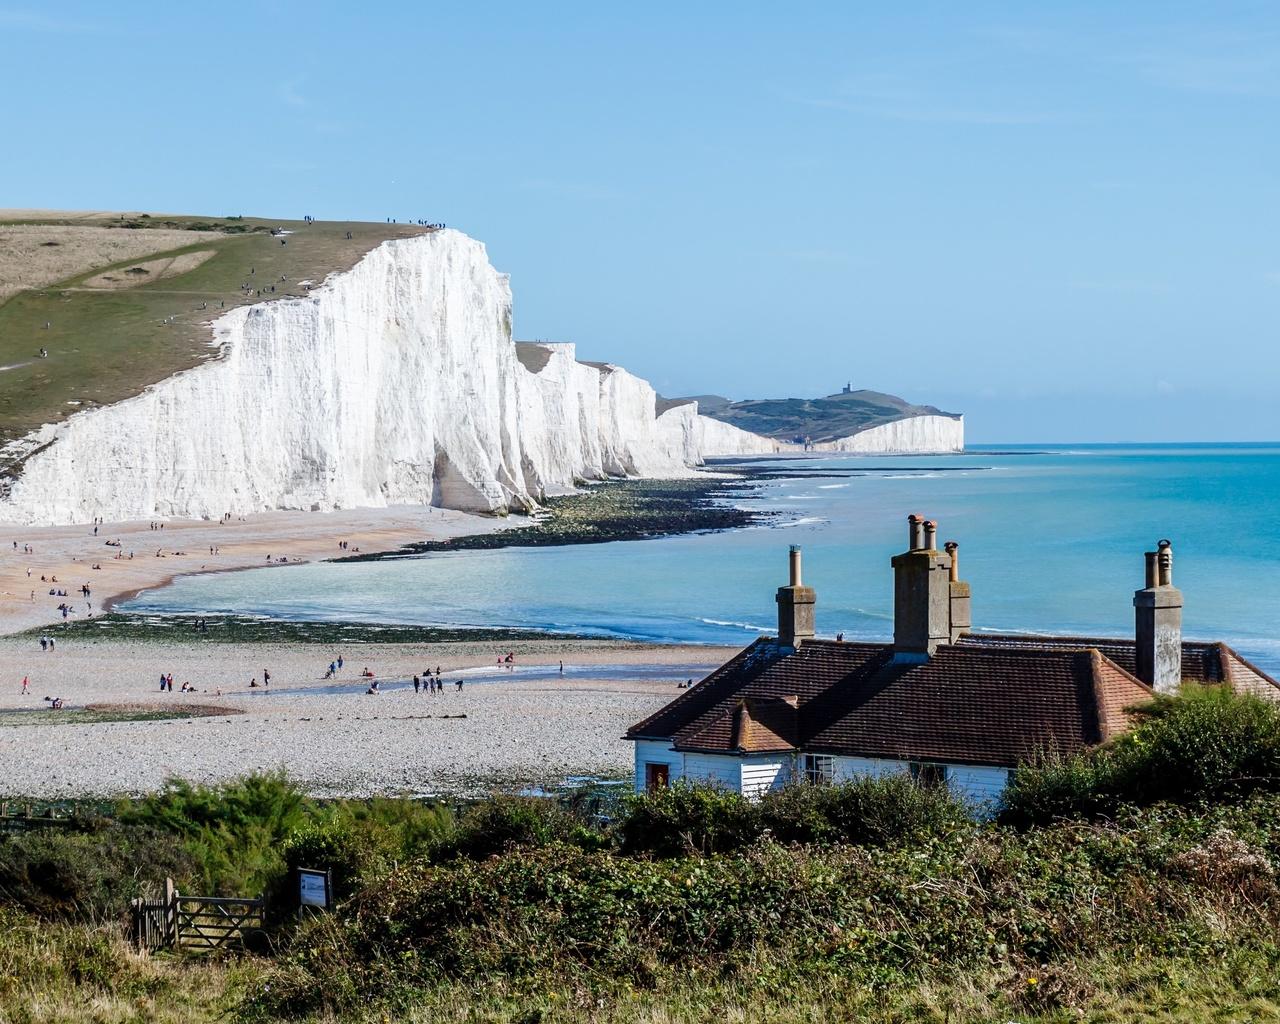 побережье, море, англия, seven sisters, national park, east sussex, скала, природа